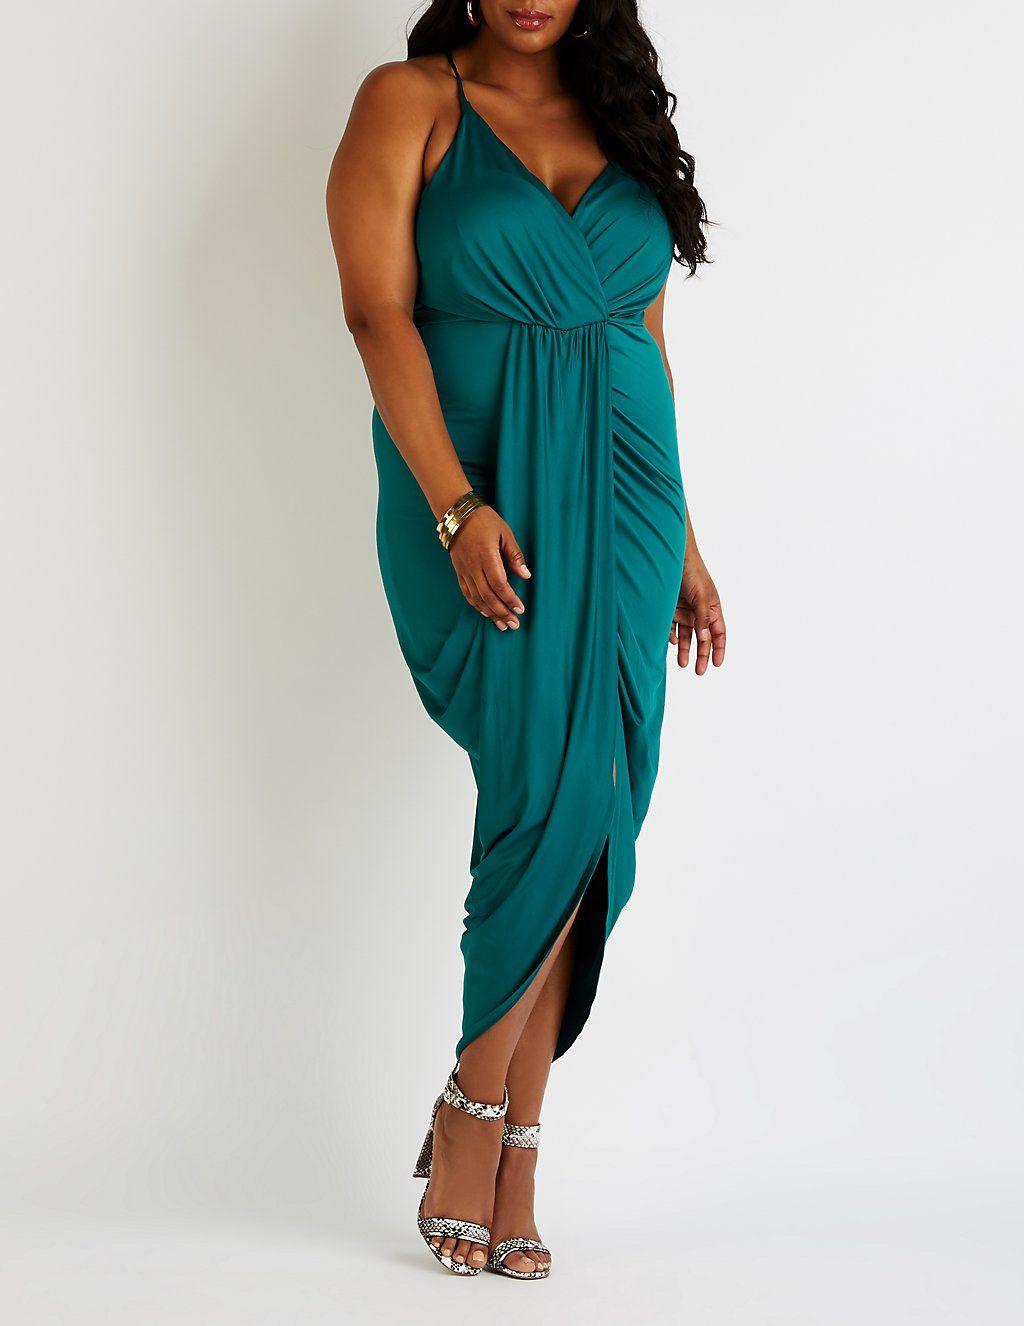 Plus Size Wrap Maxi Dress | Junior maxi dresses, Maxi wrap ...